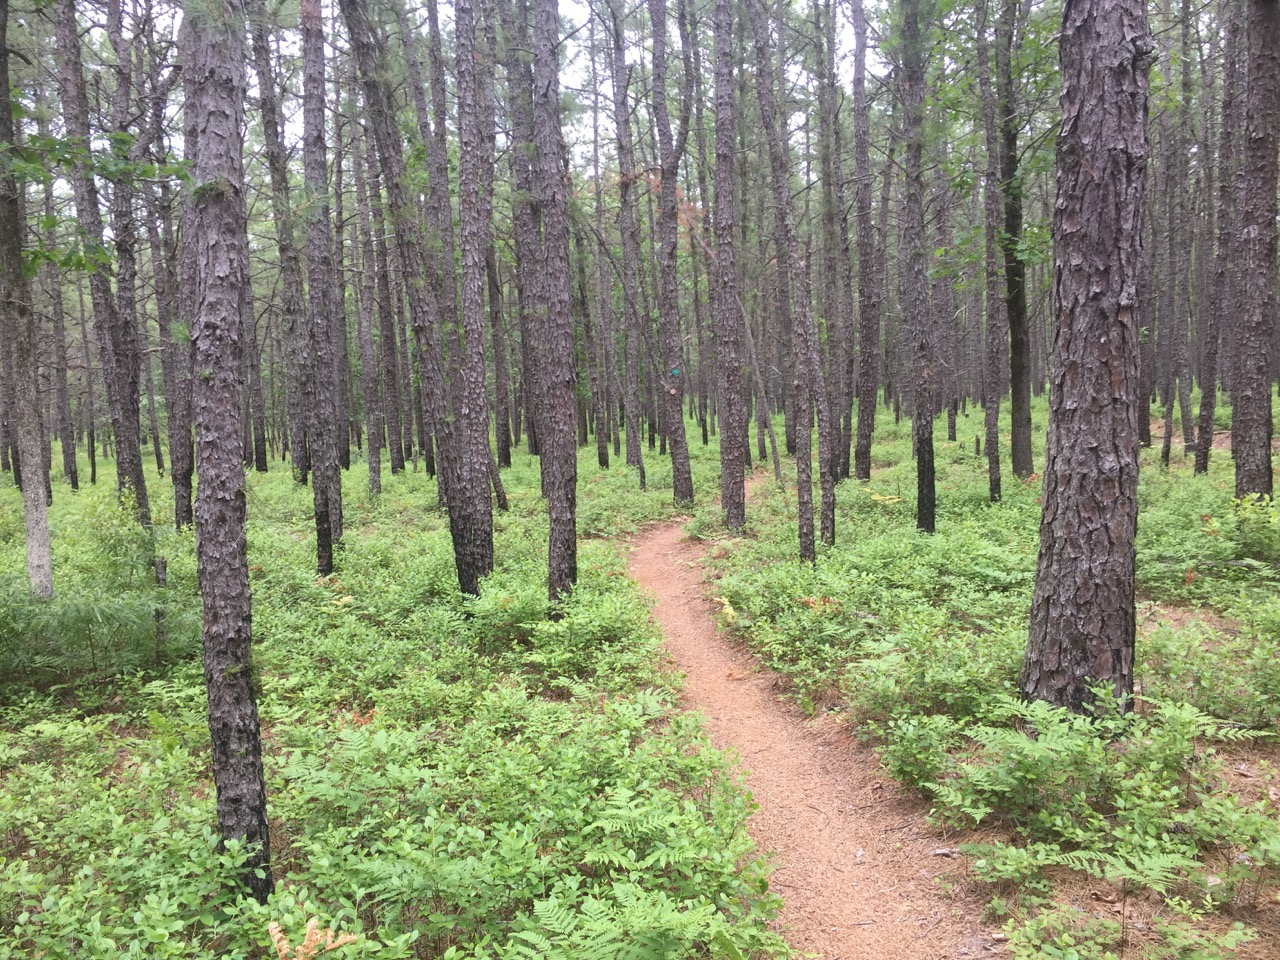 NJPineBarrens com – The Pine Barrens… One Click Away!